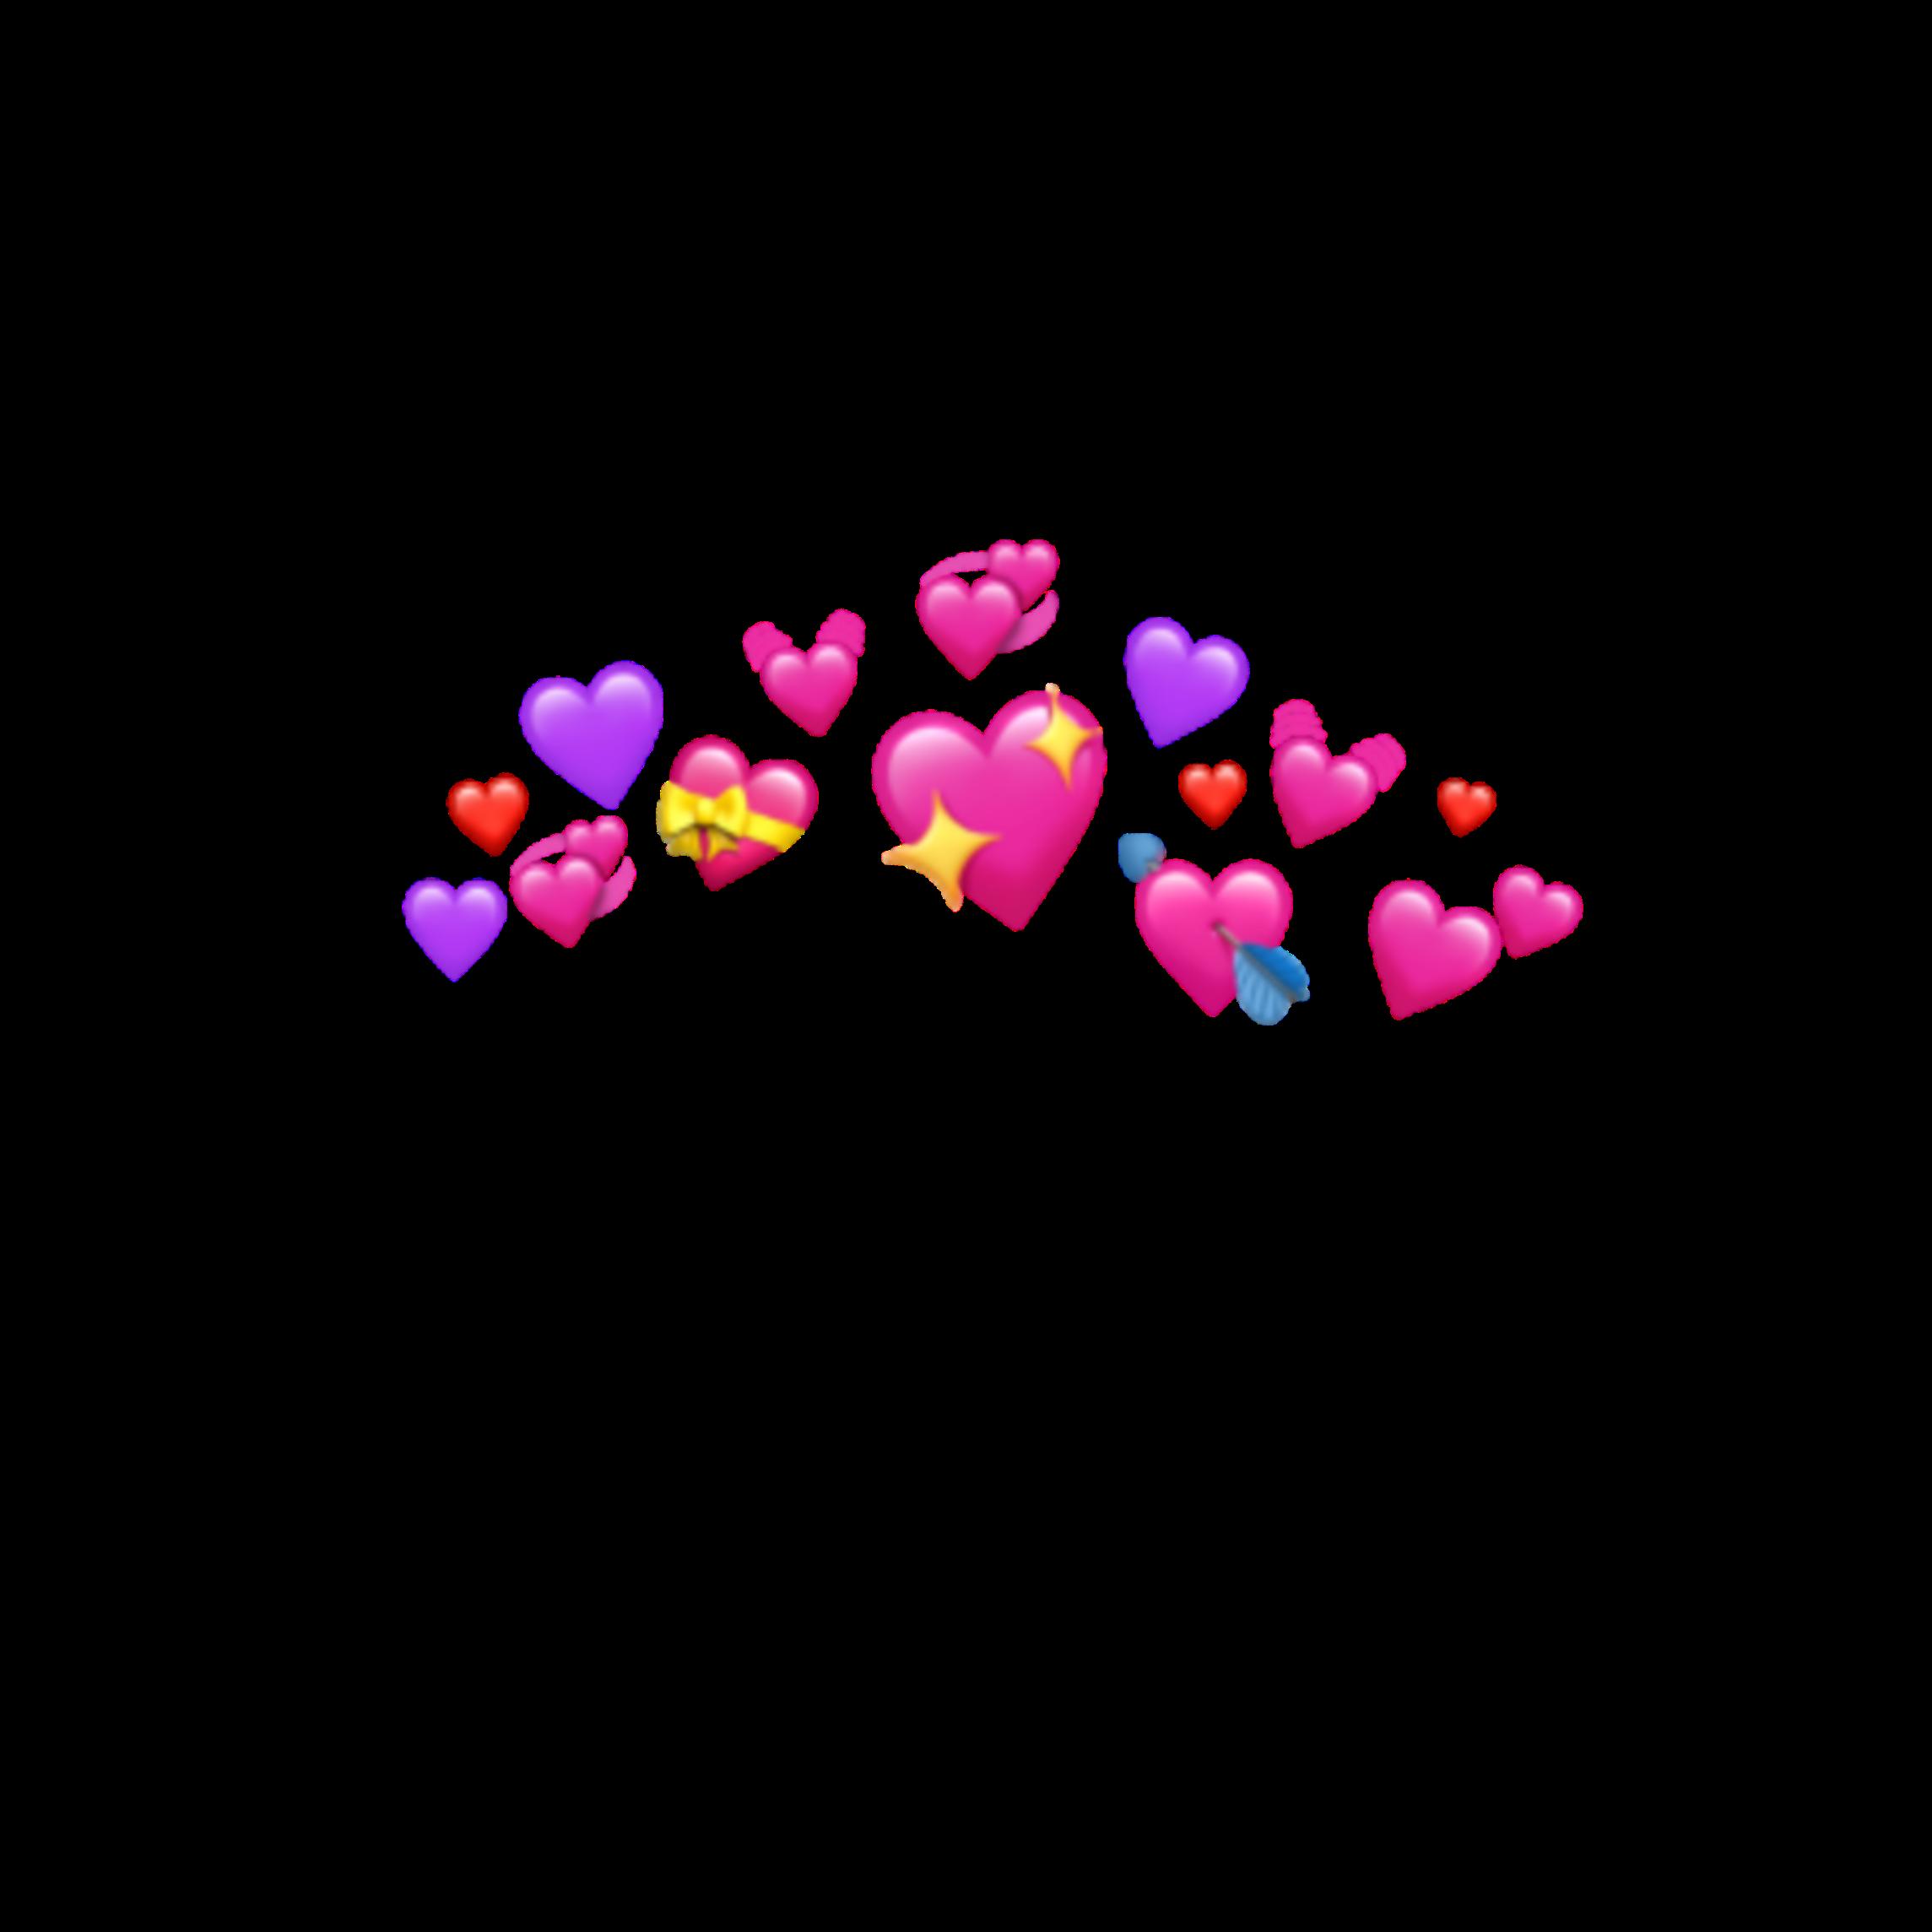 Freetoedit Coronadecorazones Corono Png Tumblr Stikers Corazones Coronas Colors Remixit Emoji Backgrounds Emoji Wallpaper Iphone Emoji Art